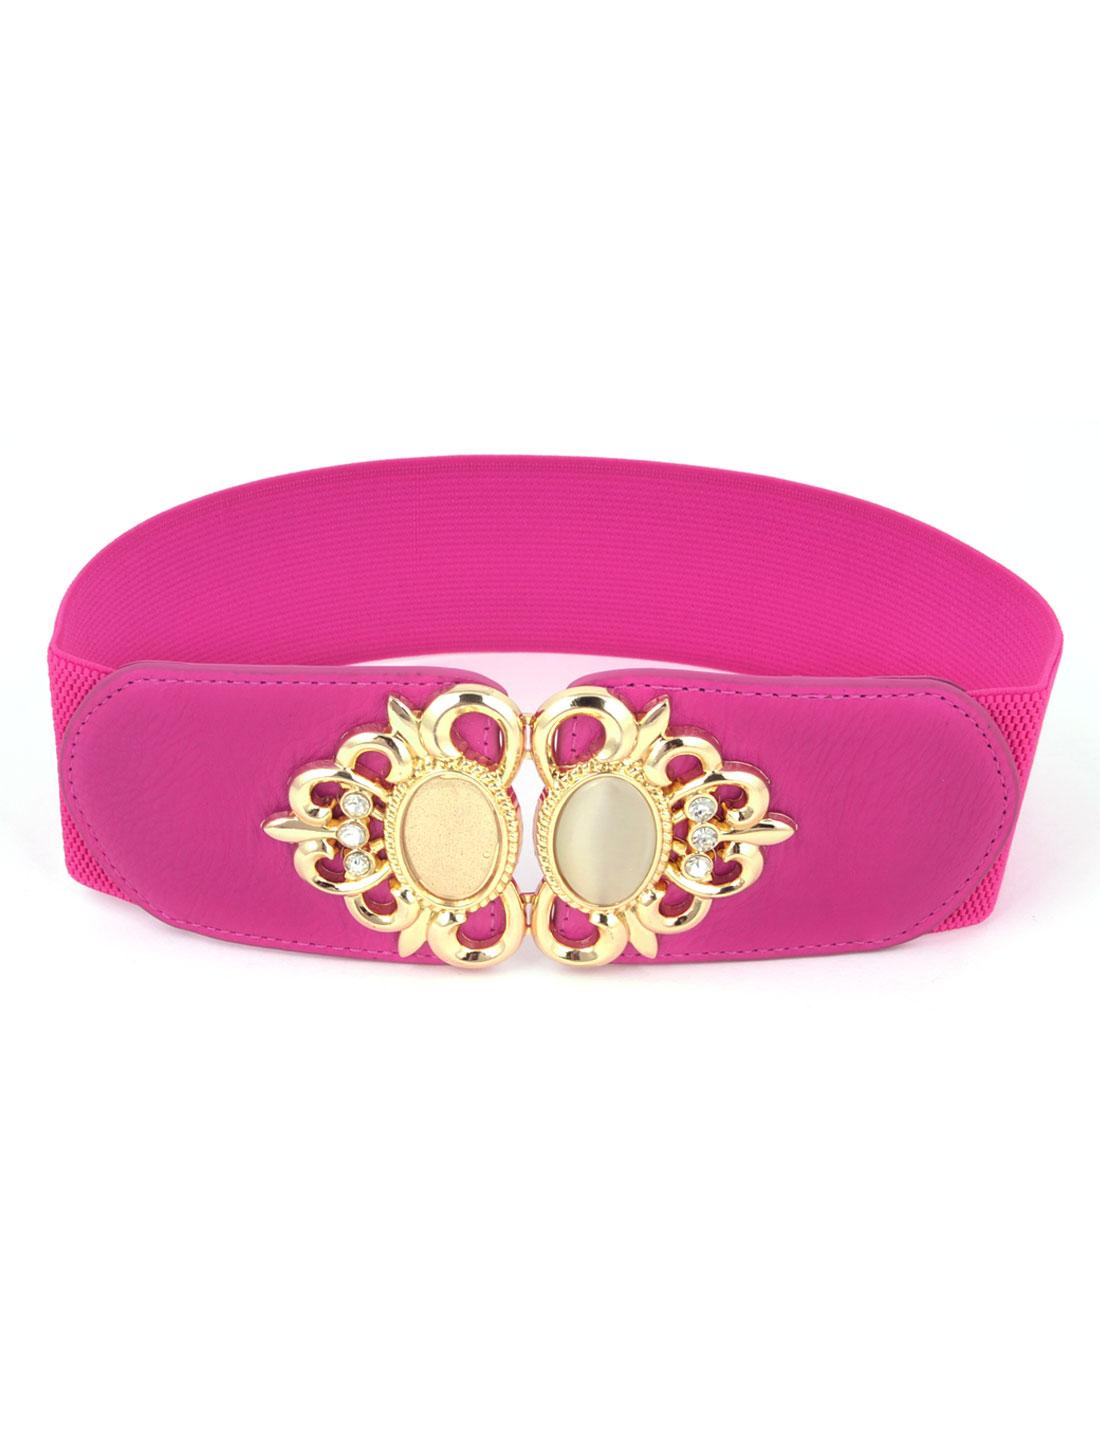 Ladies Plastic Bead Inlay Flower Frame Interlocking Buckle Elastic Waist Belt Fuchsia